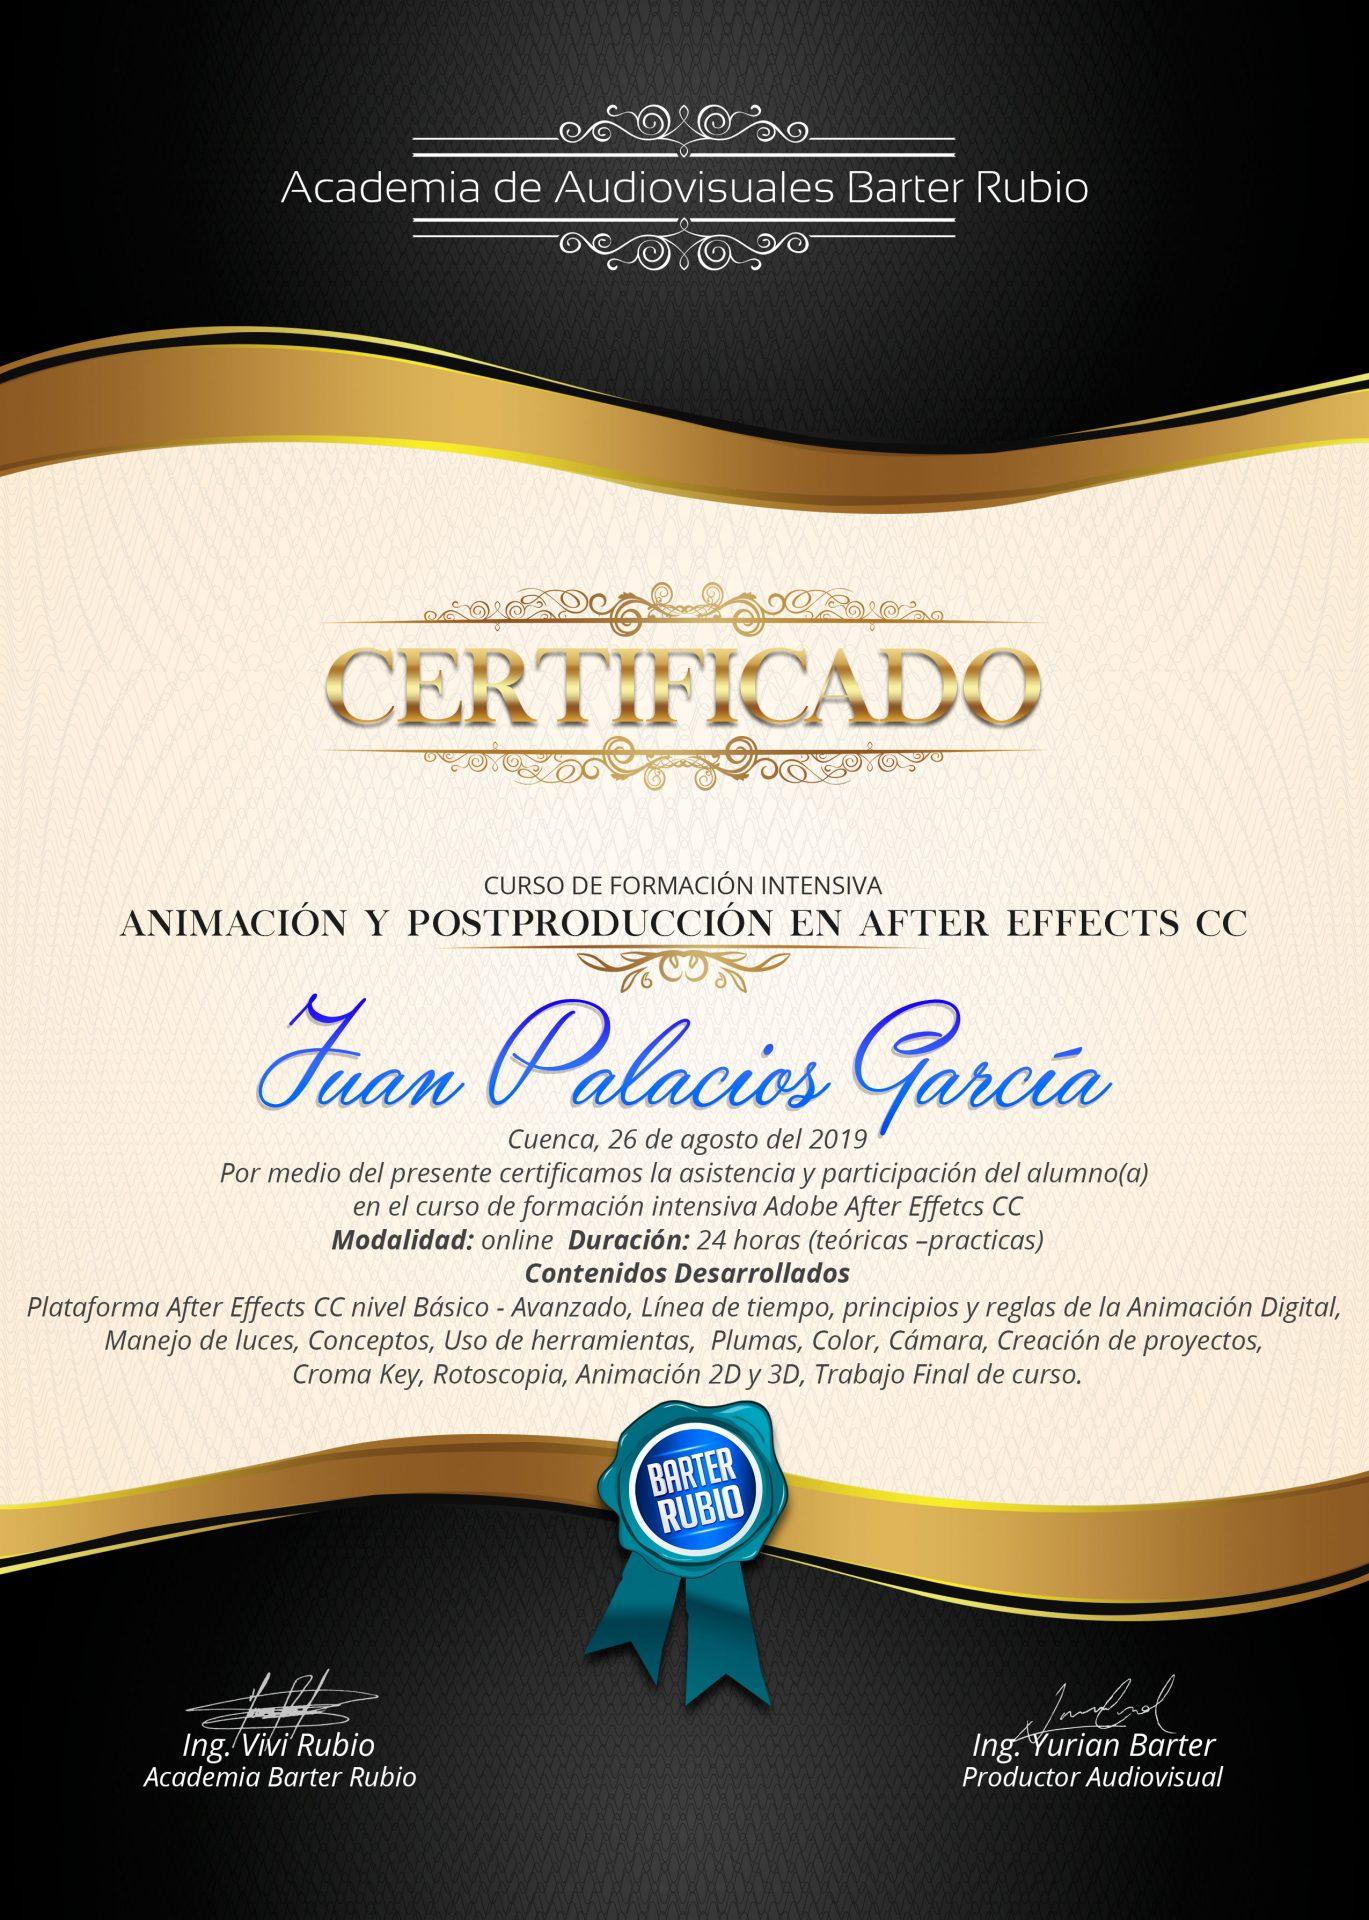 Certificado-Curso-de-After-effects-Academia-Barter-Rubio